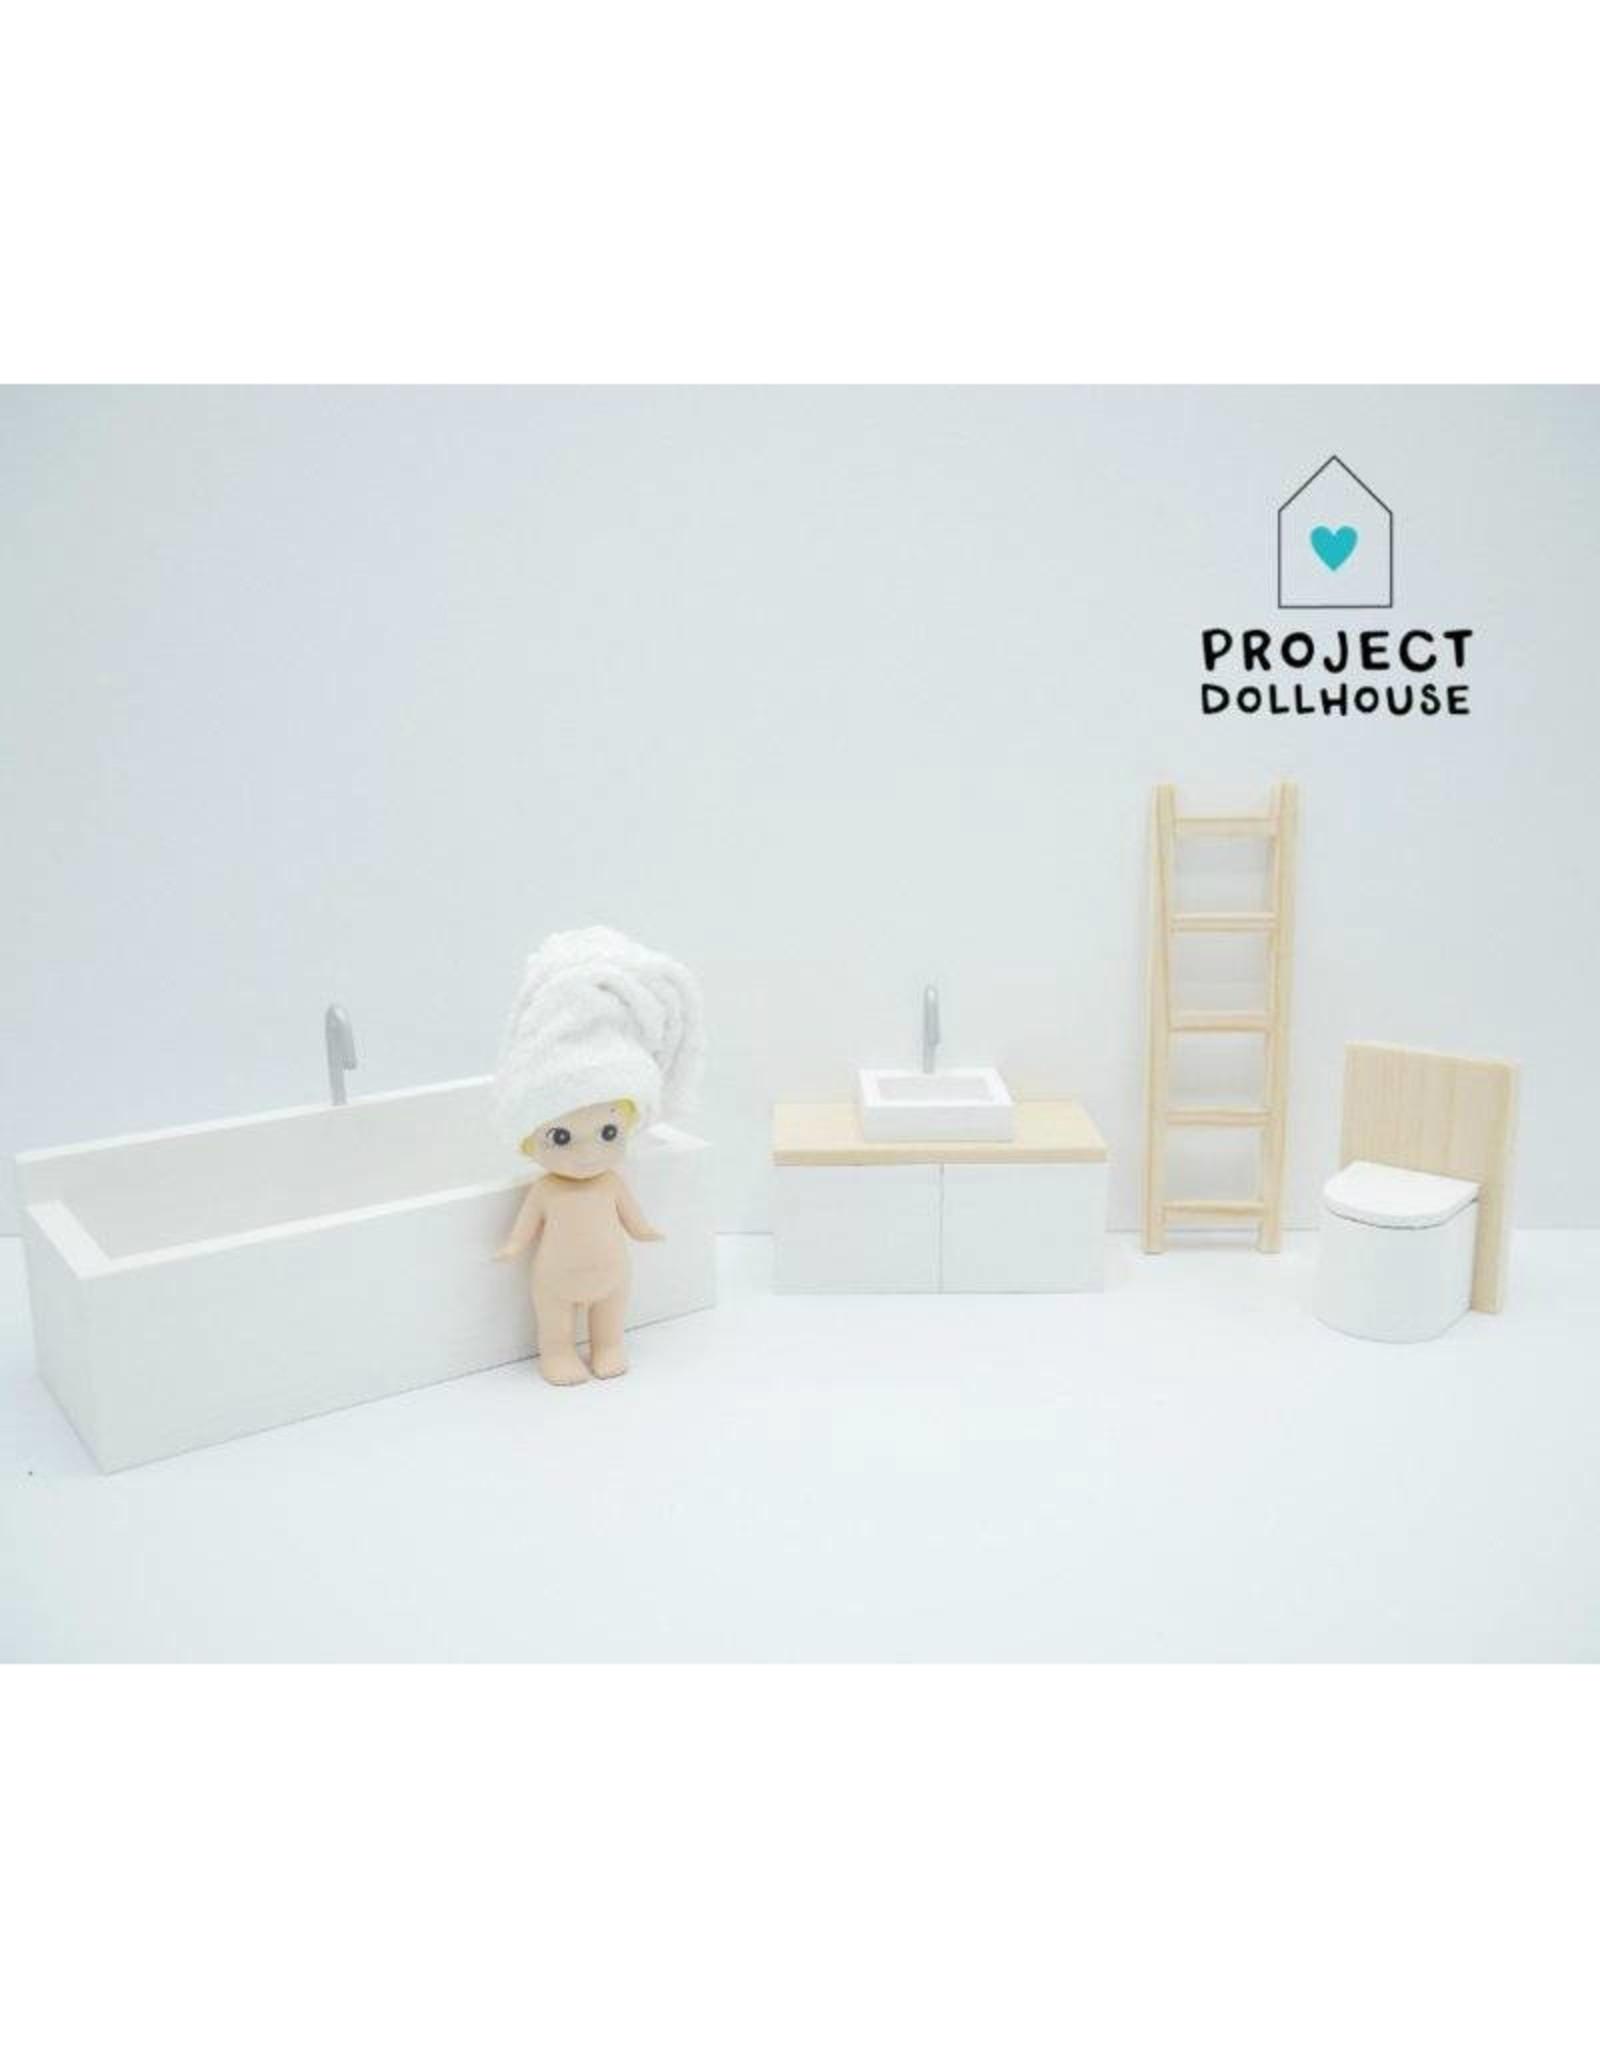 Project Dollhouse Wooden bathroom